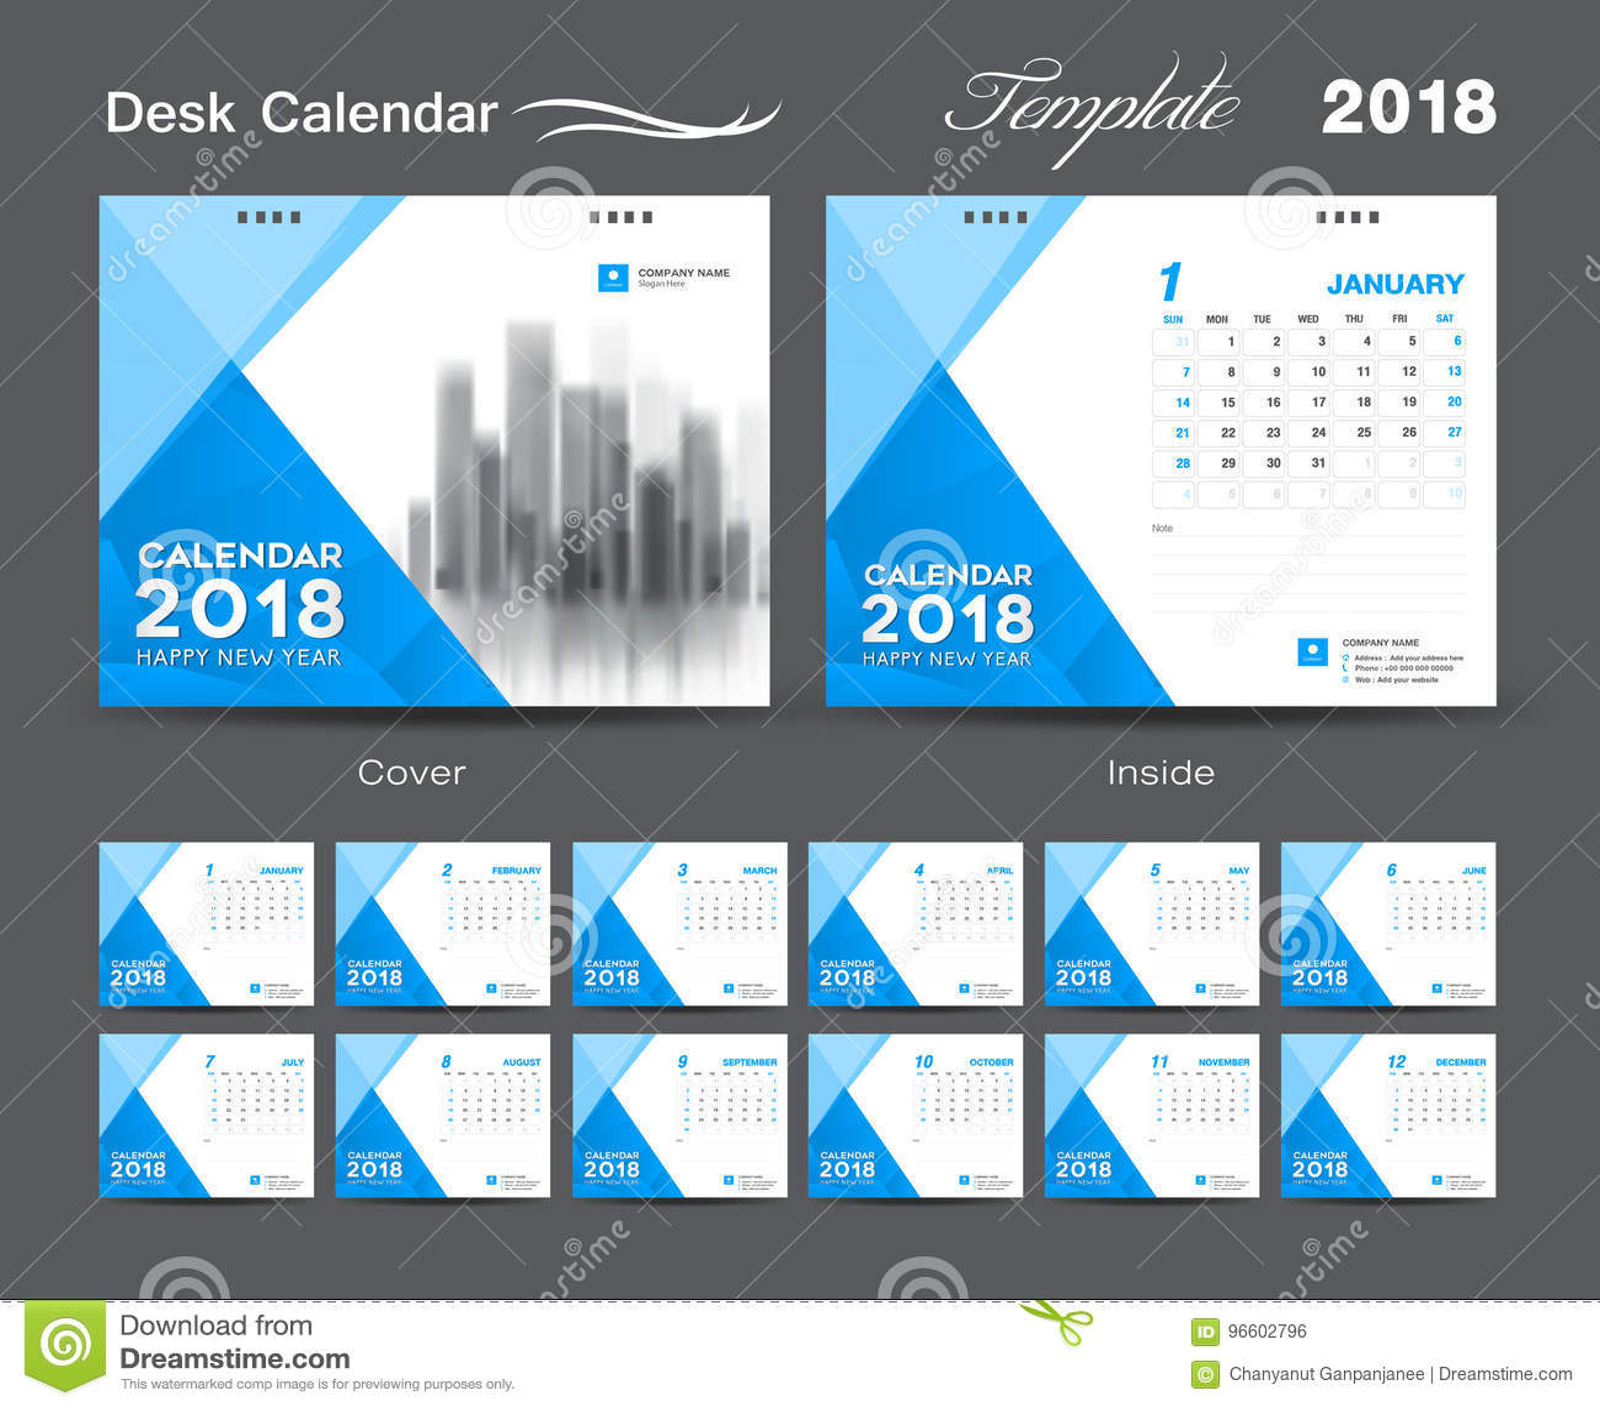 Calendar Layout Design : Desk calendar template layout design blue cover